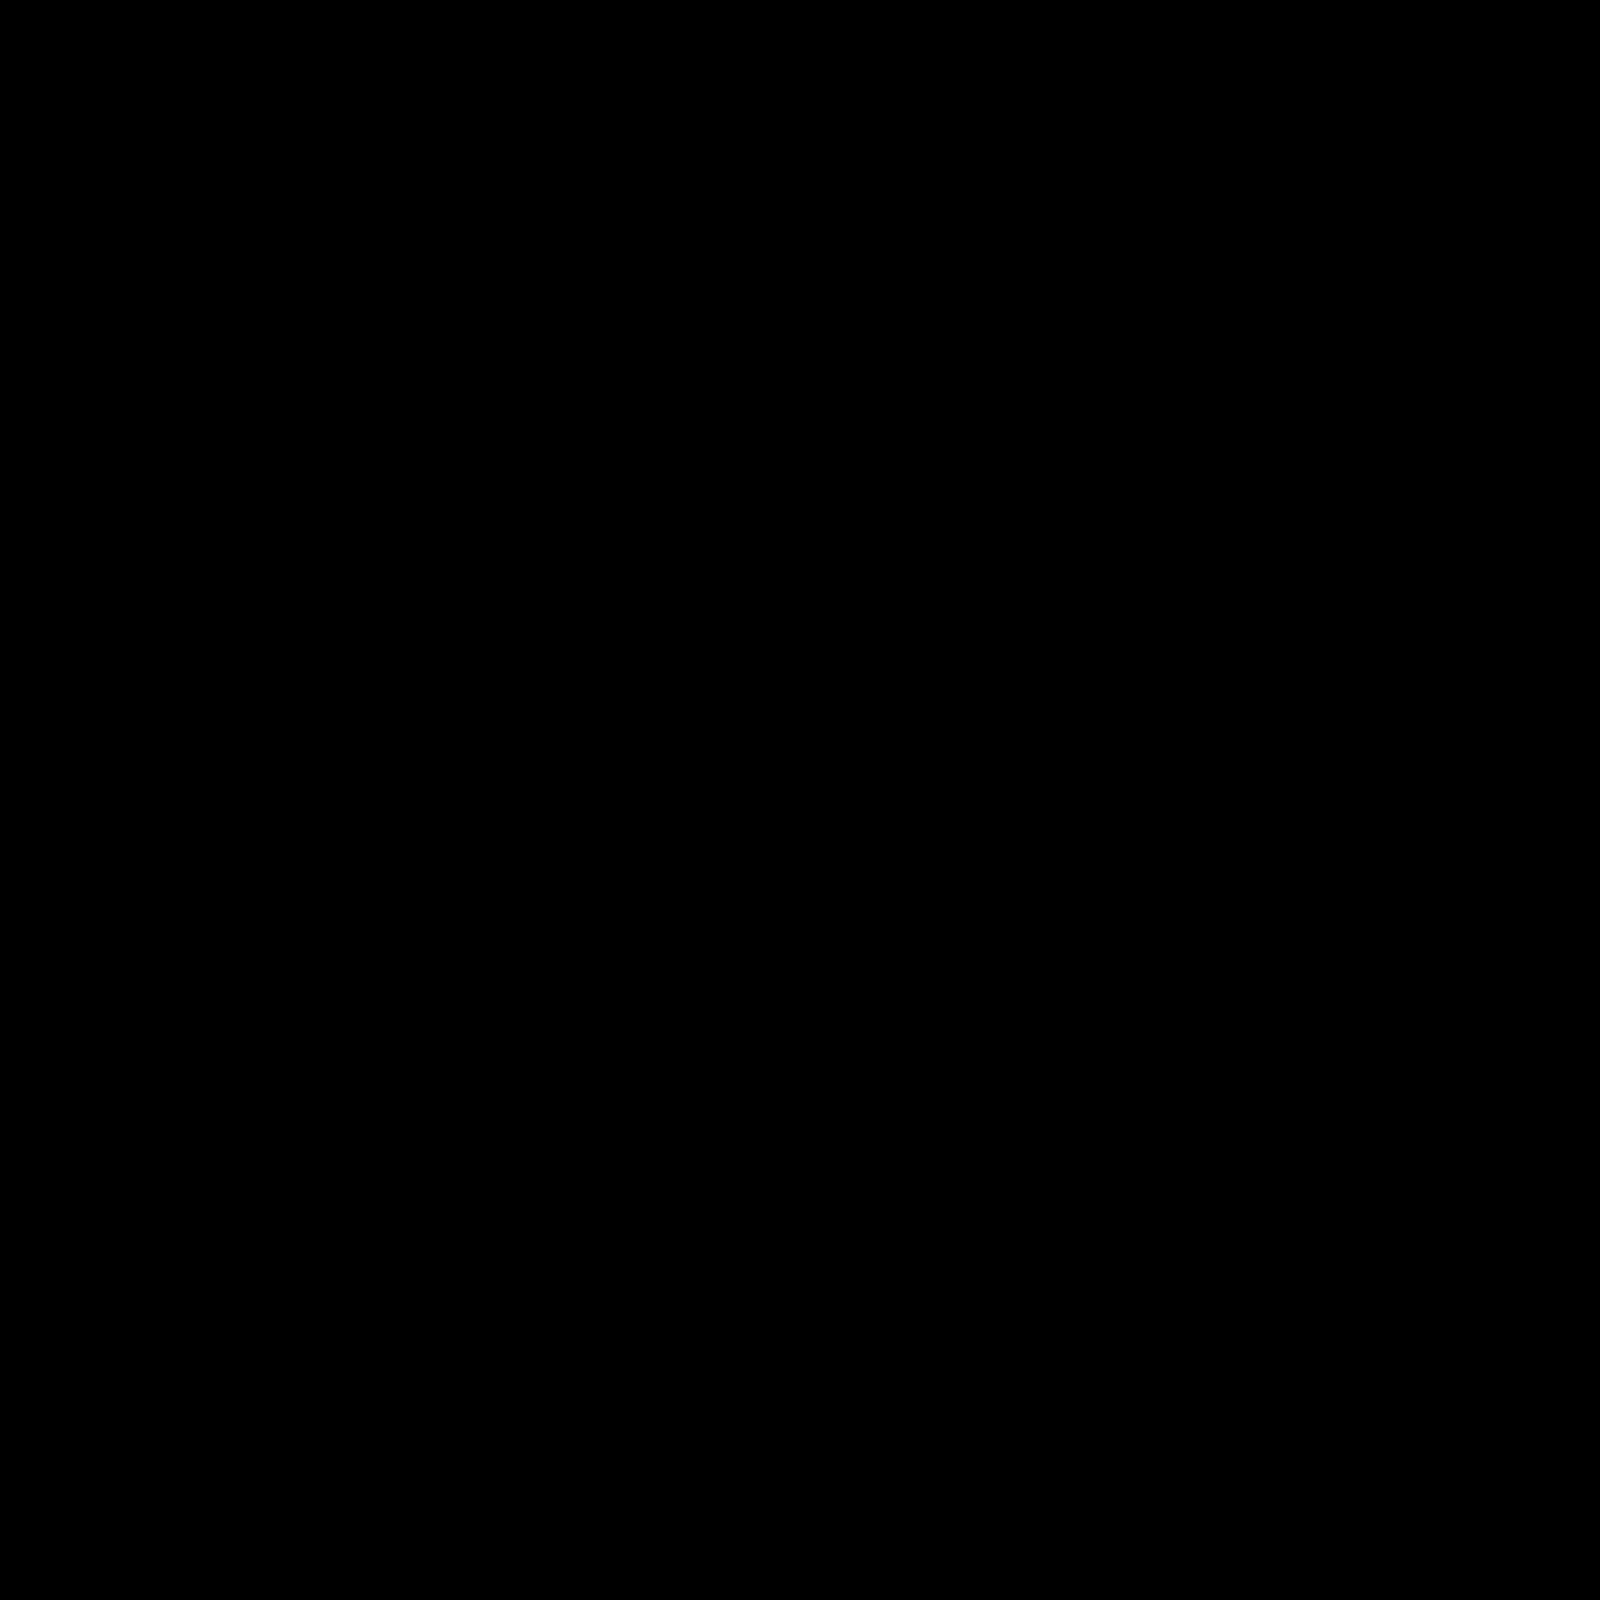 Chevron w dół icon